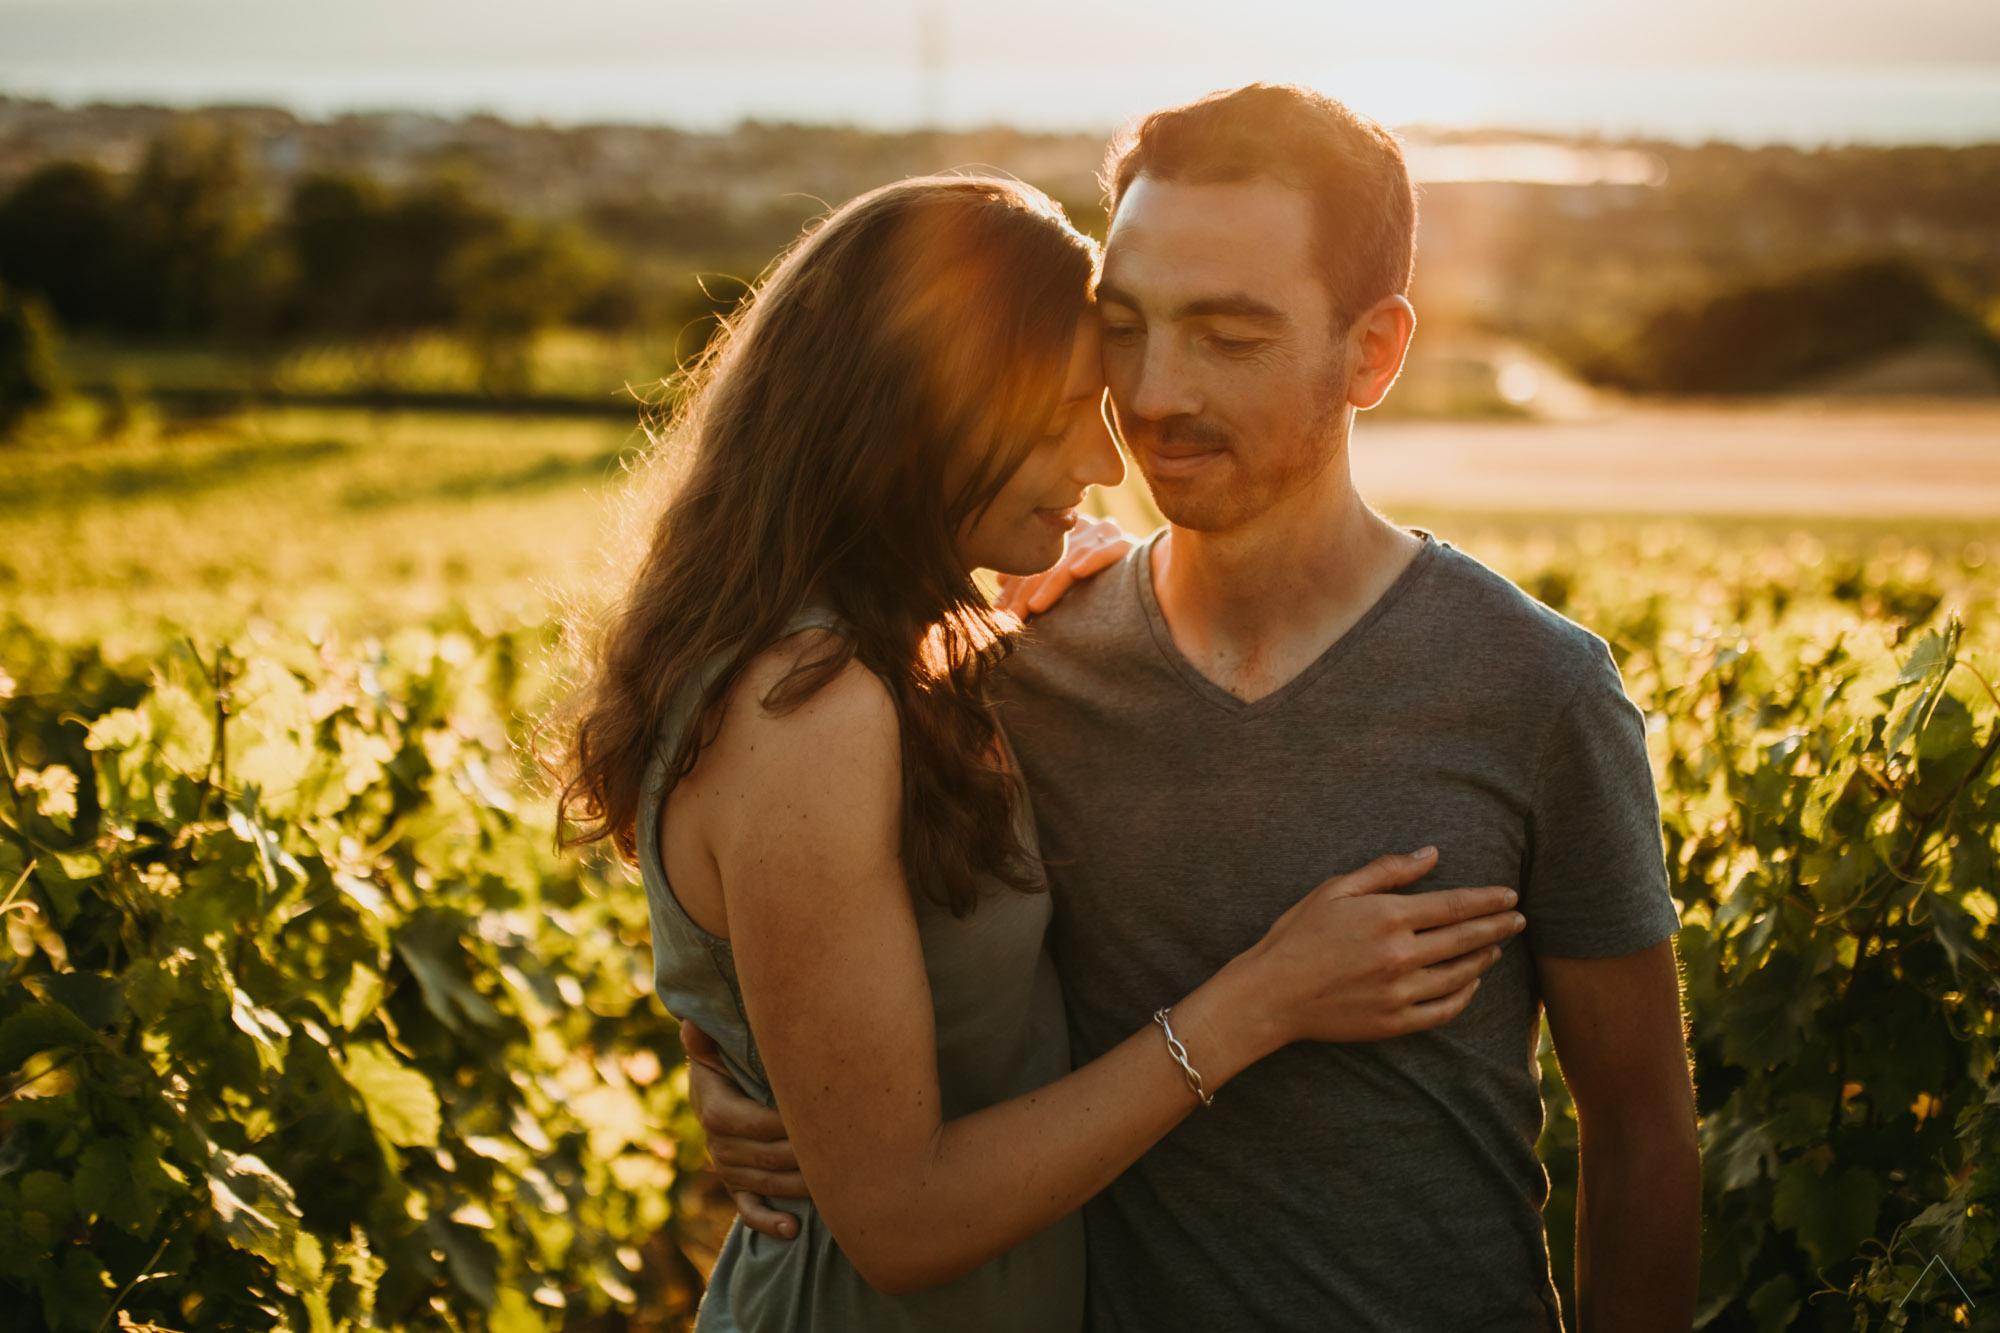 Vanessa Amiot photographe - photographe couple thonon - photographe thonon - photographe intime thonon -